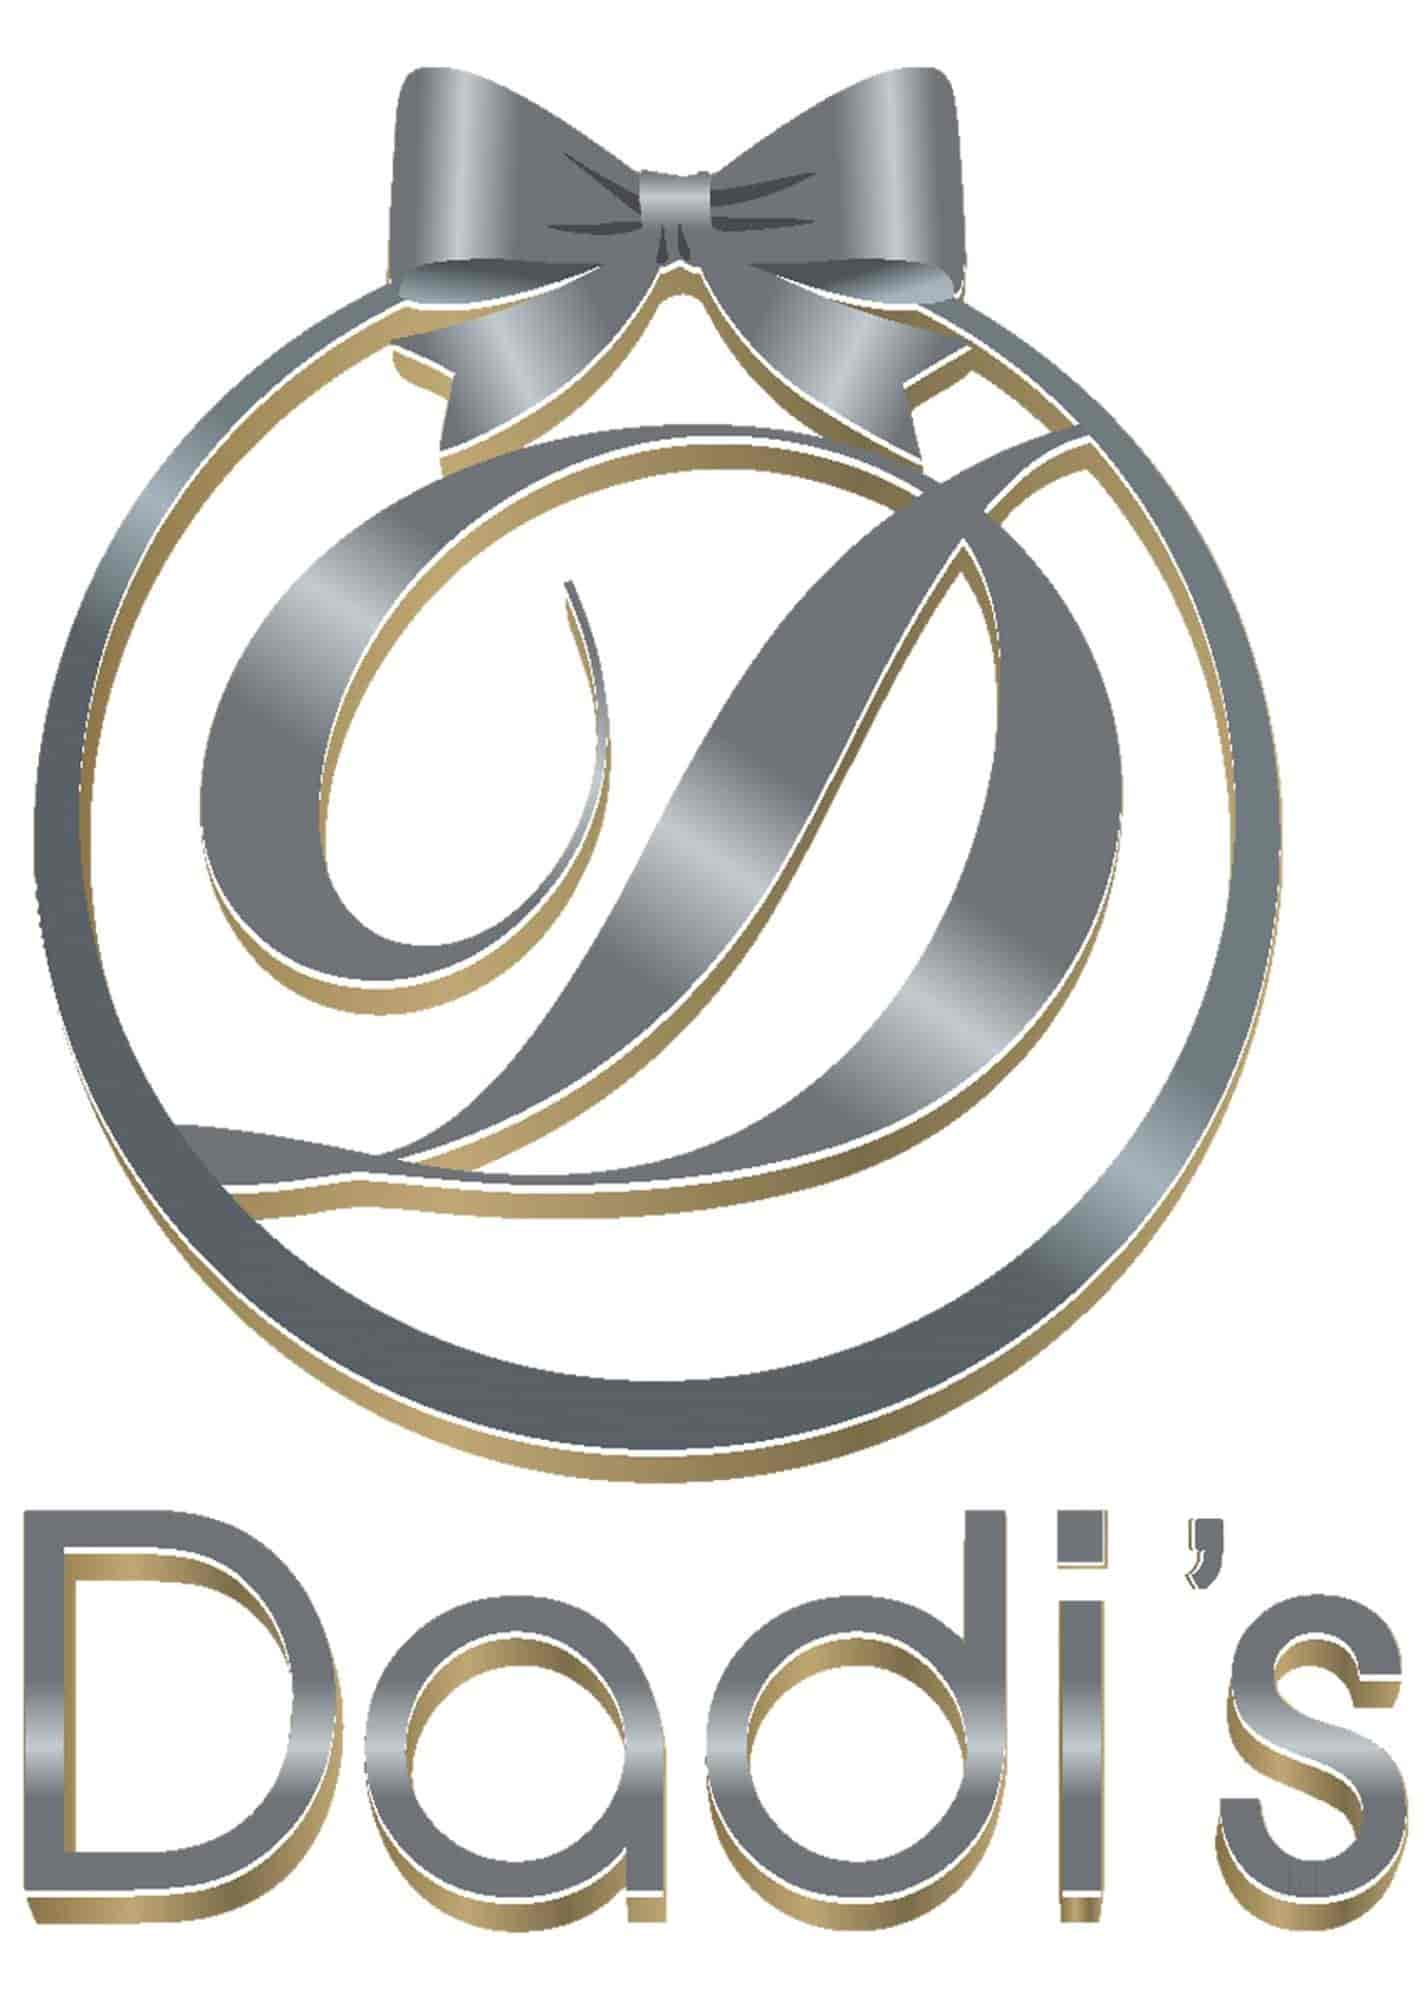 Dadis motijhil jewellery showrooms in kolkata justdial thecheapjerseys Images